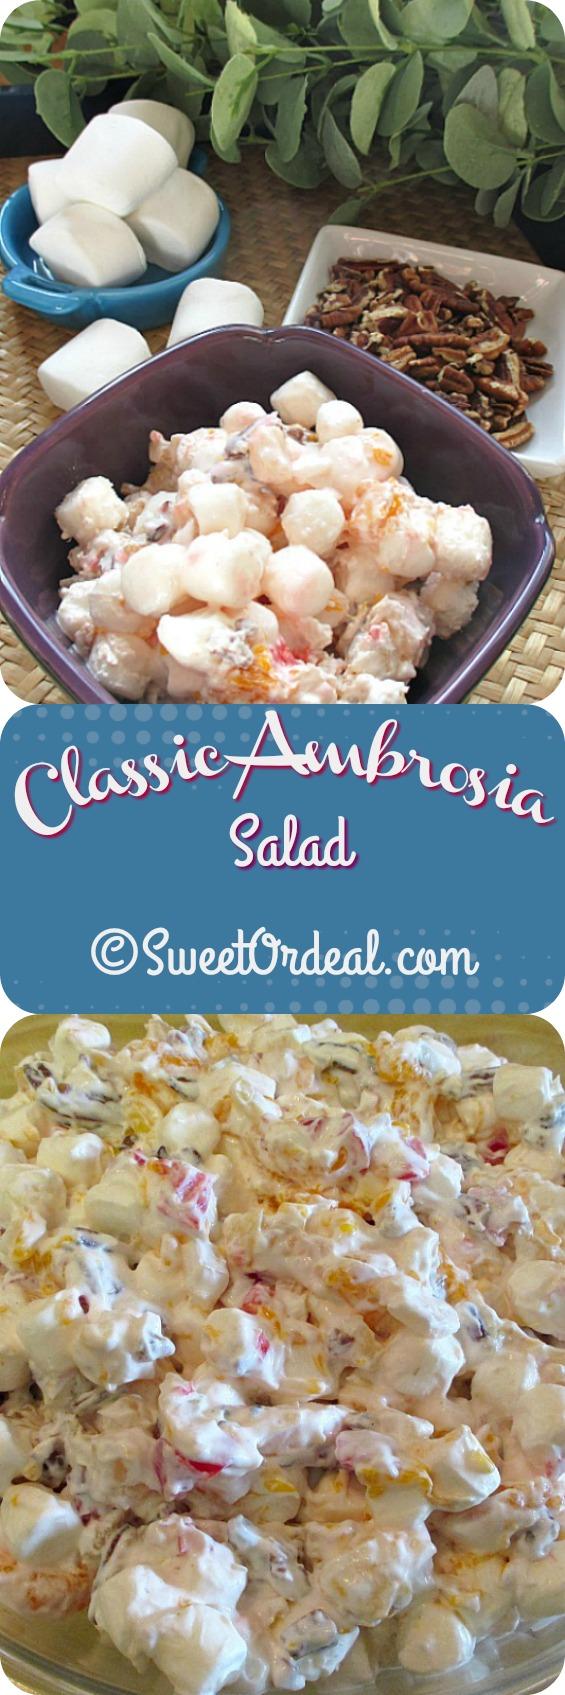 Classic Ambrosia Salad